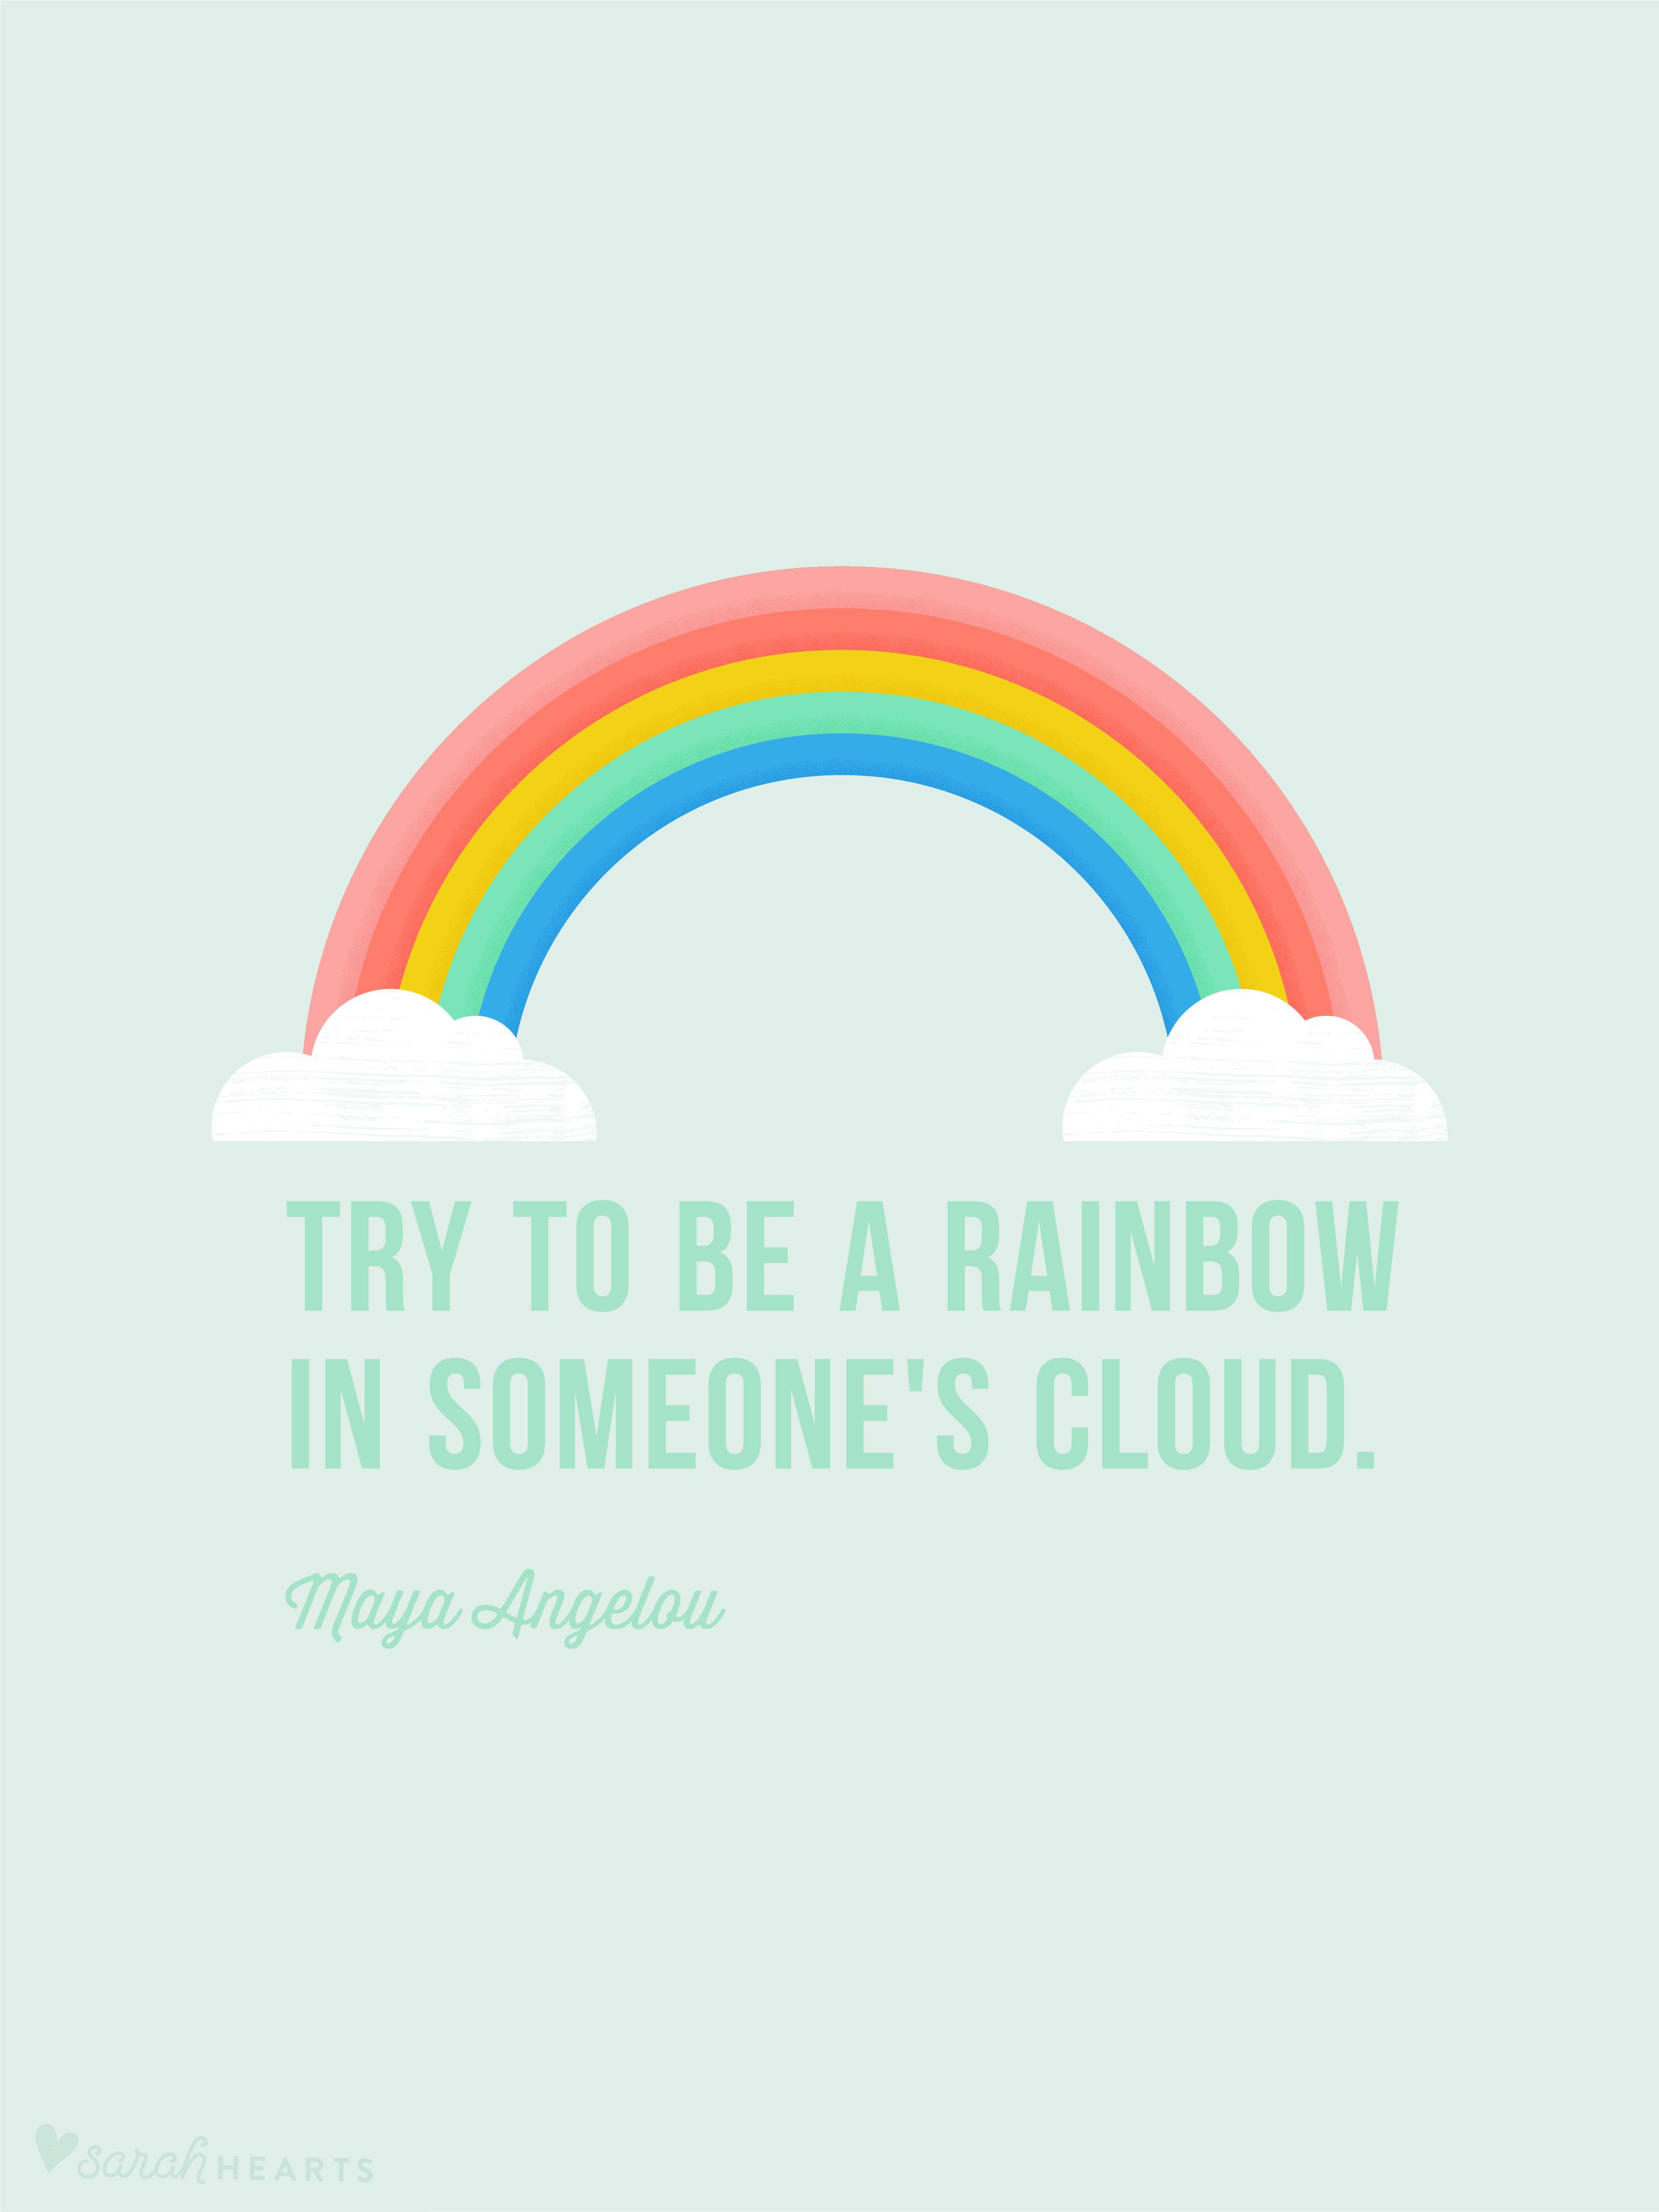 rainbow march 2017 calendar wallpaper sarah hearts